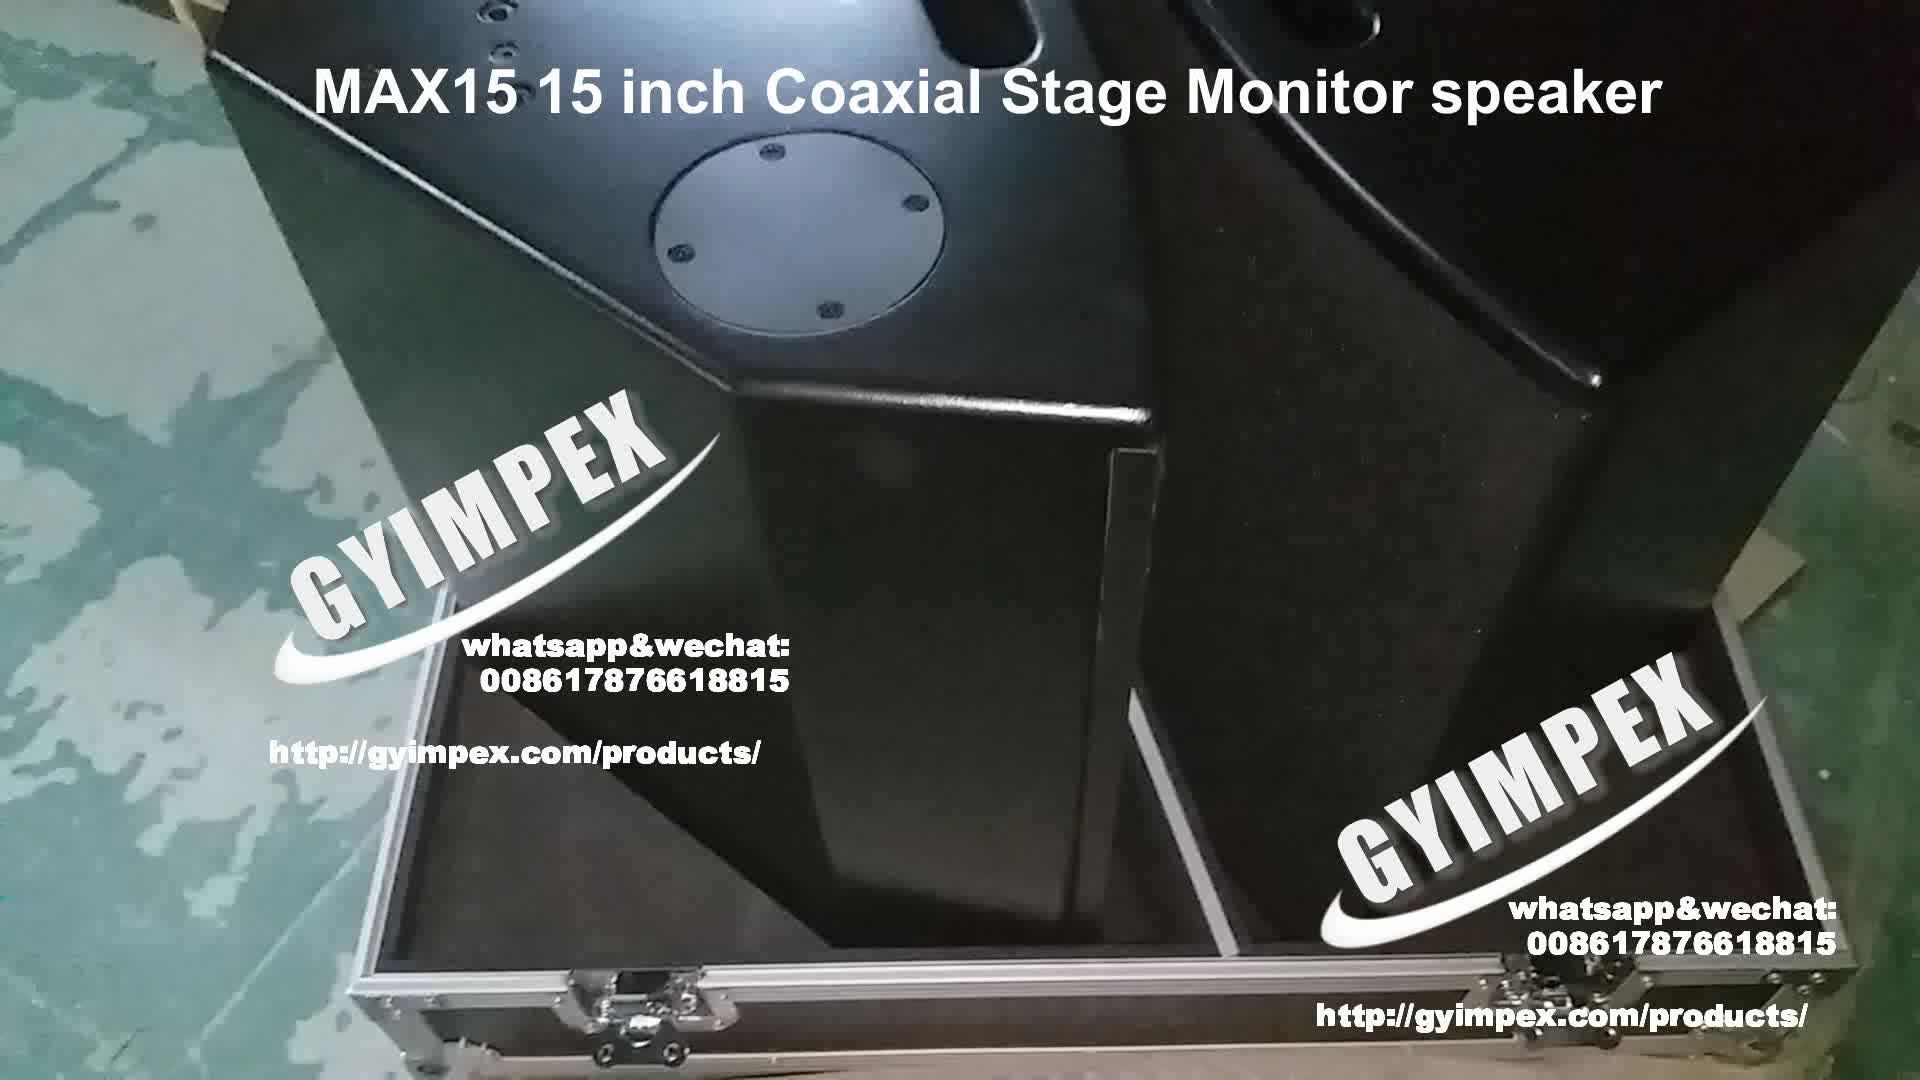 Großhandelschina factroy 15-Zoll-Bodenstudio-aktiver Monitorlautsprecher-Koaxialkasten MAX15